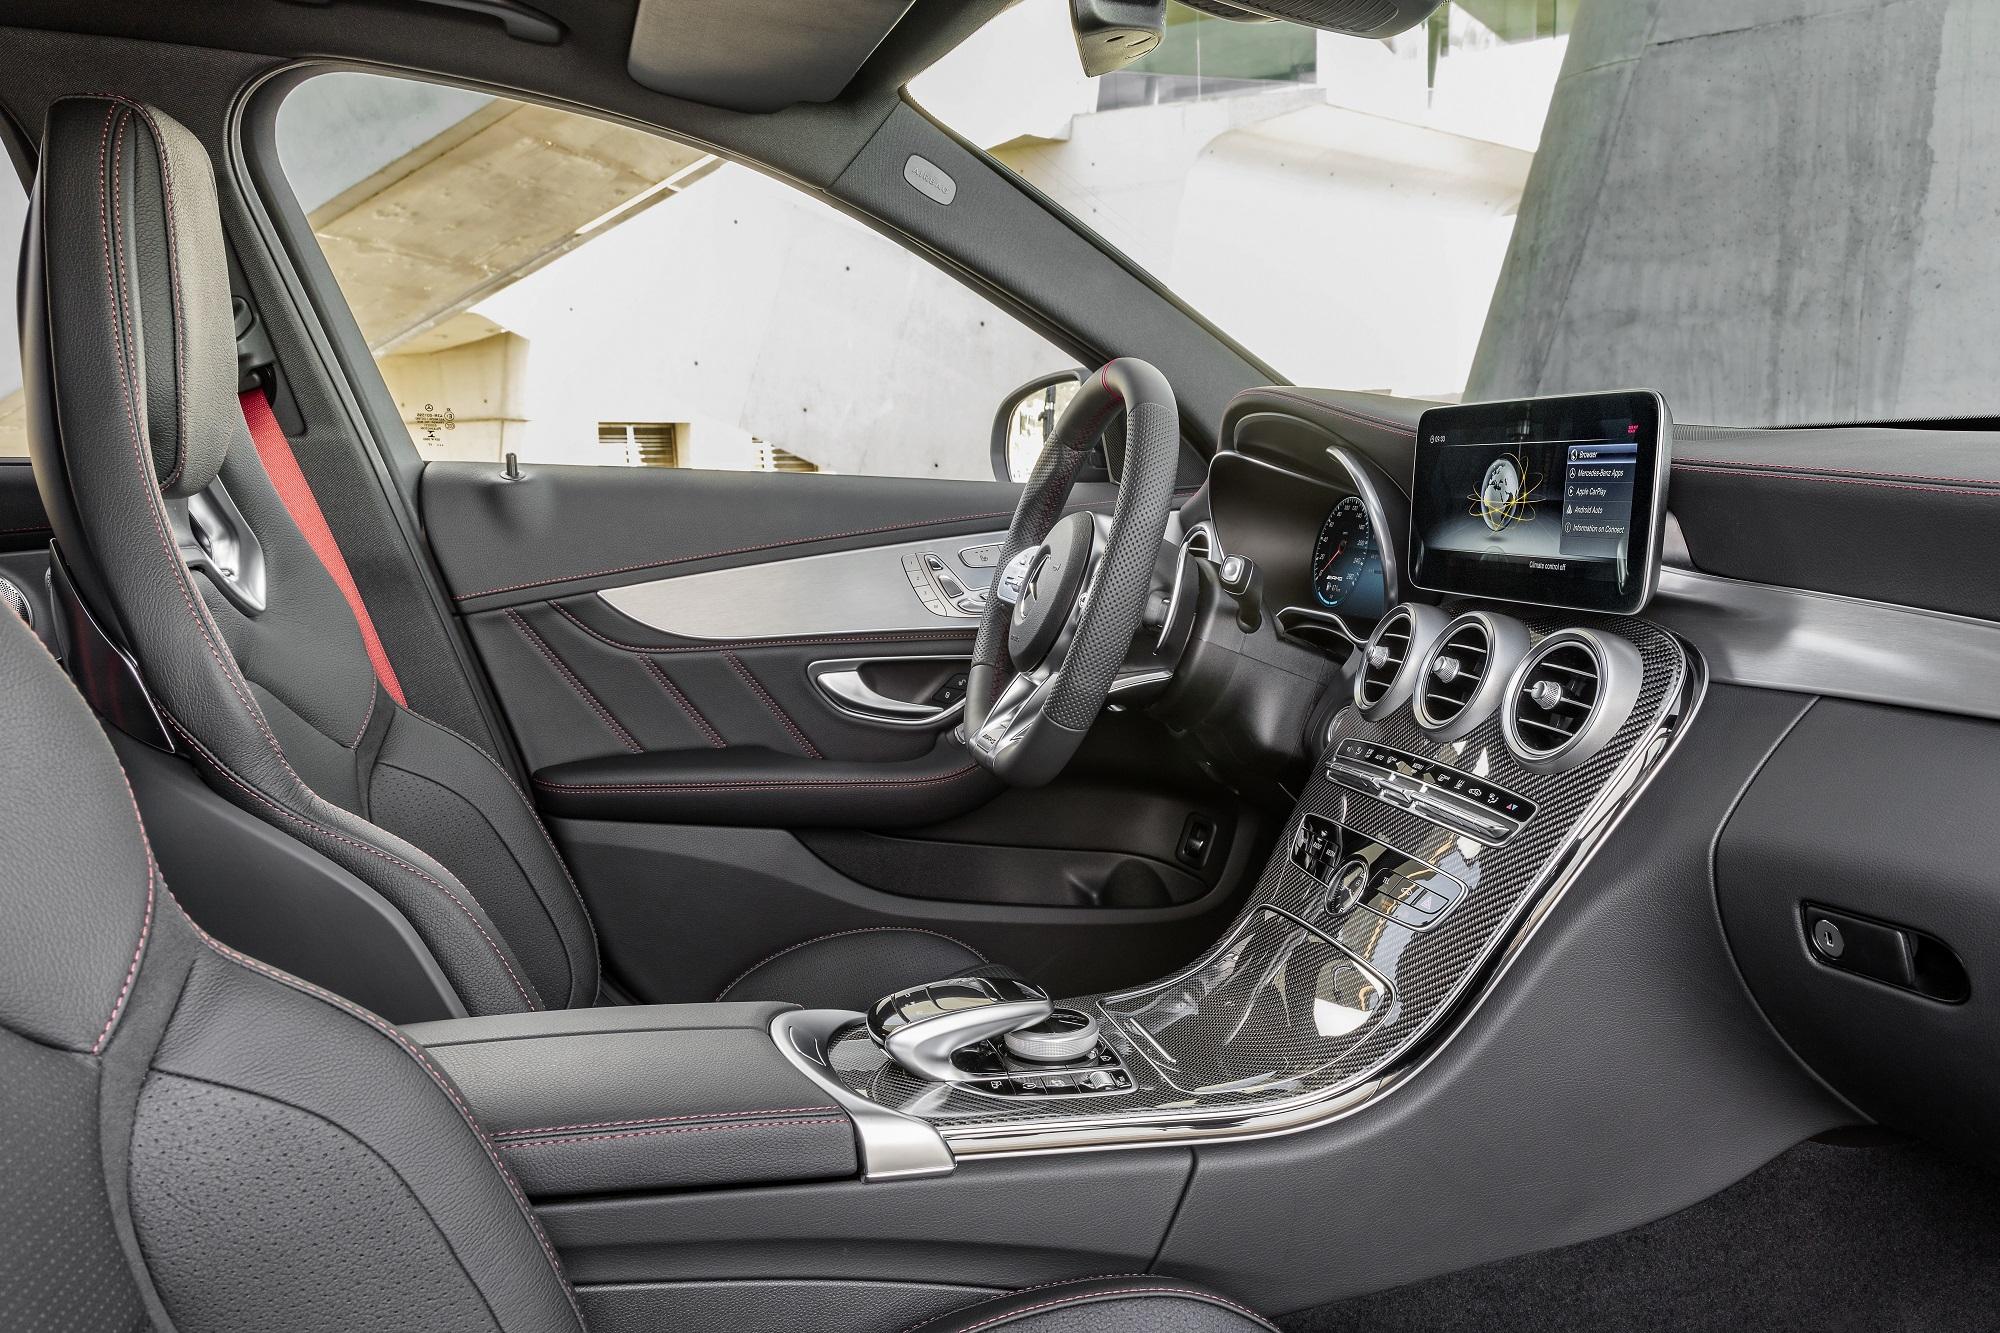 MBWorld.org Mercedes-Benz Mercedes-AMG AMG 2019 C43 Sedan